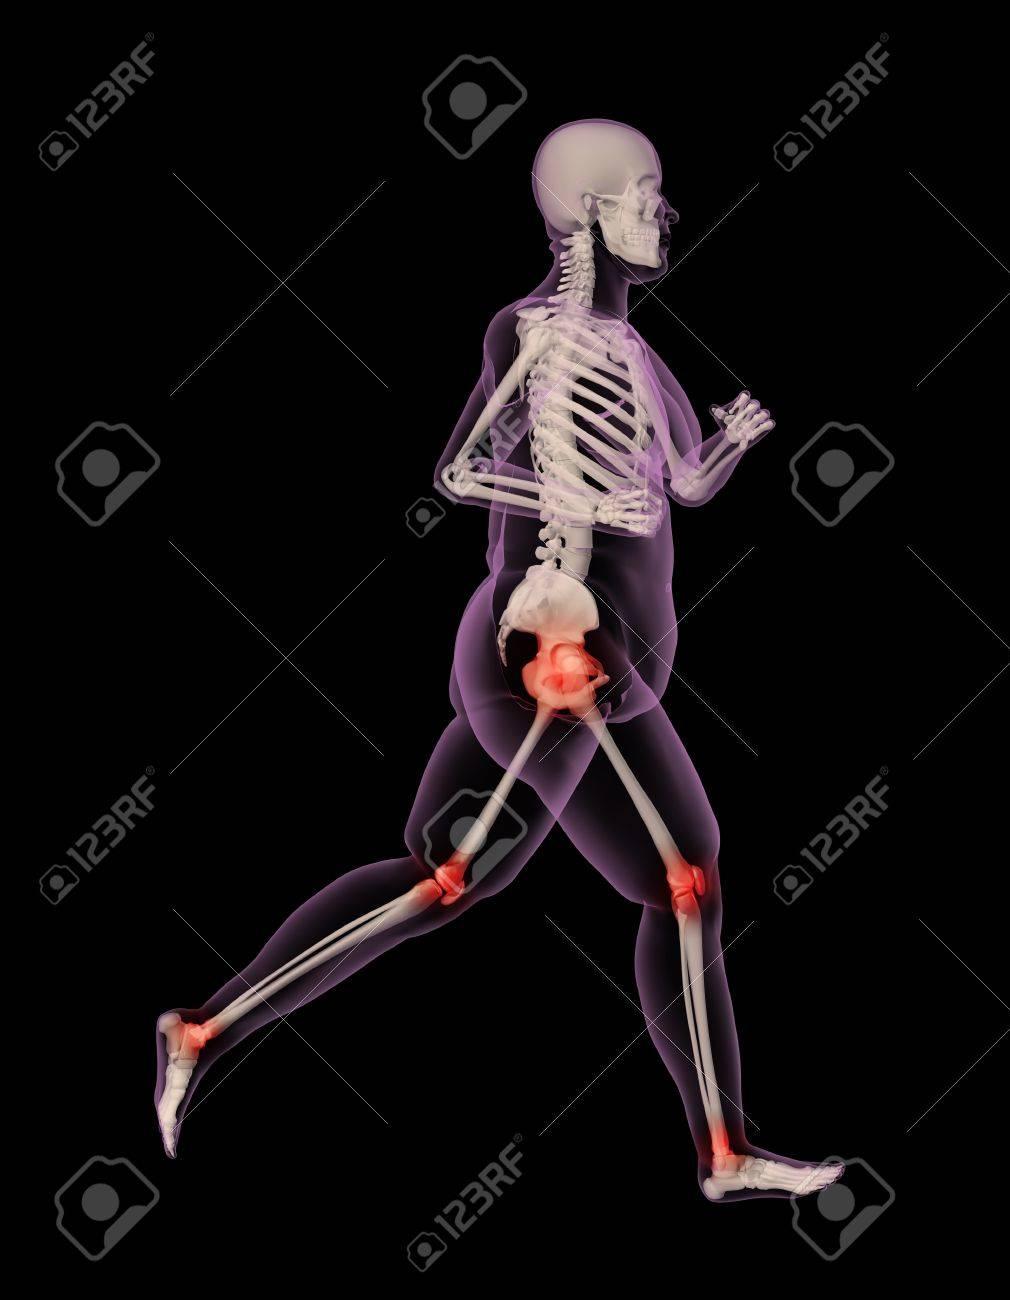 3d Render Of An Overweight Female Skeleton Running Showing Pressure